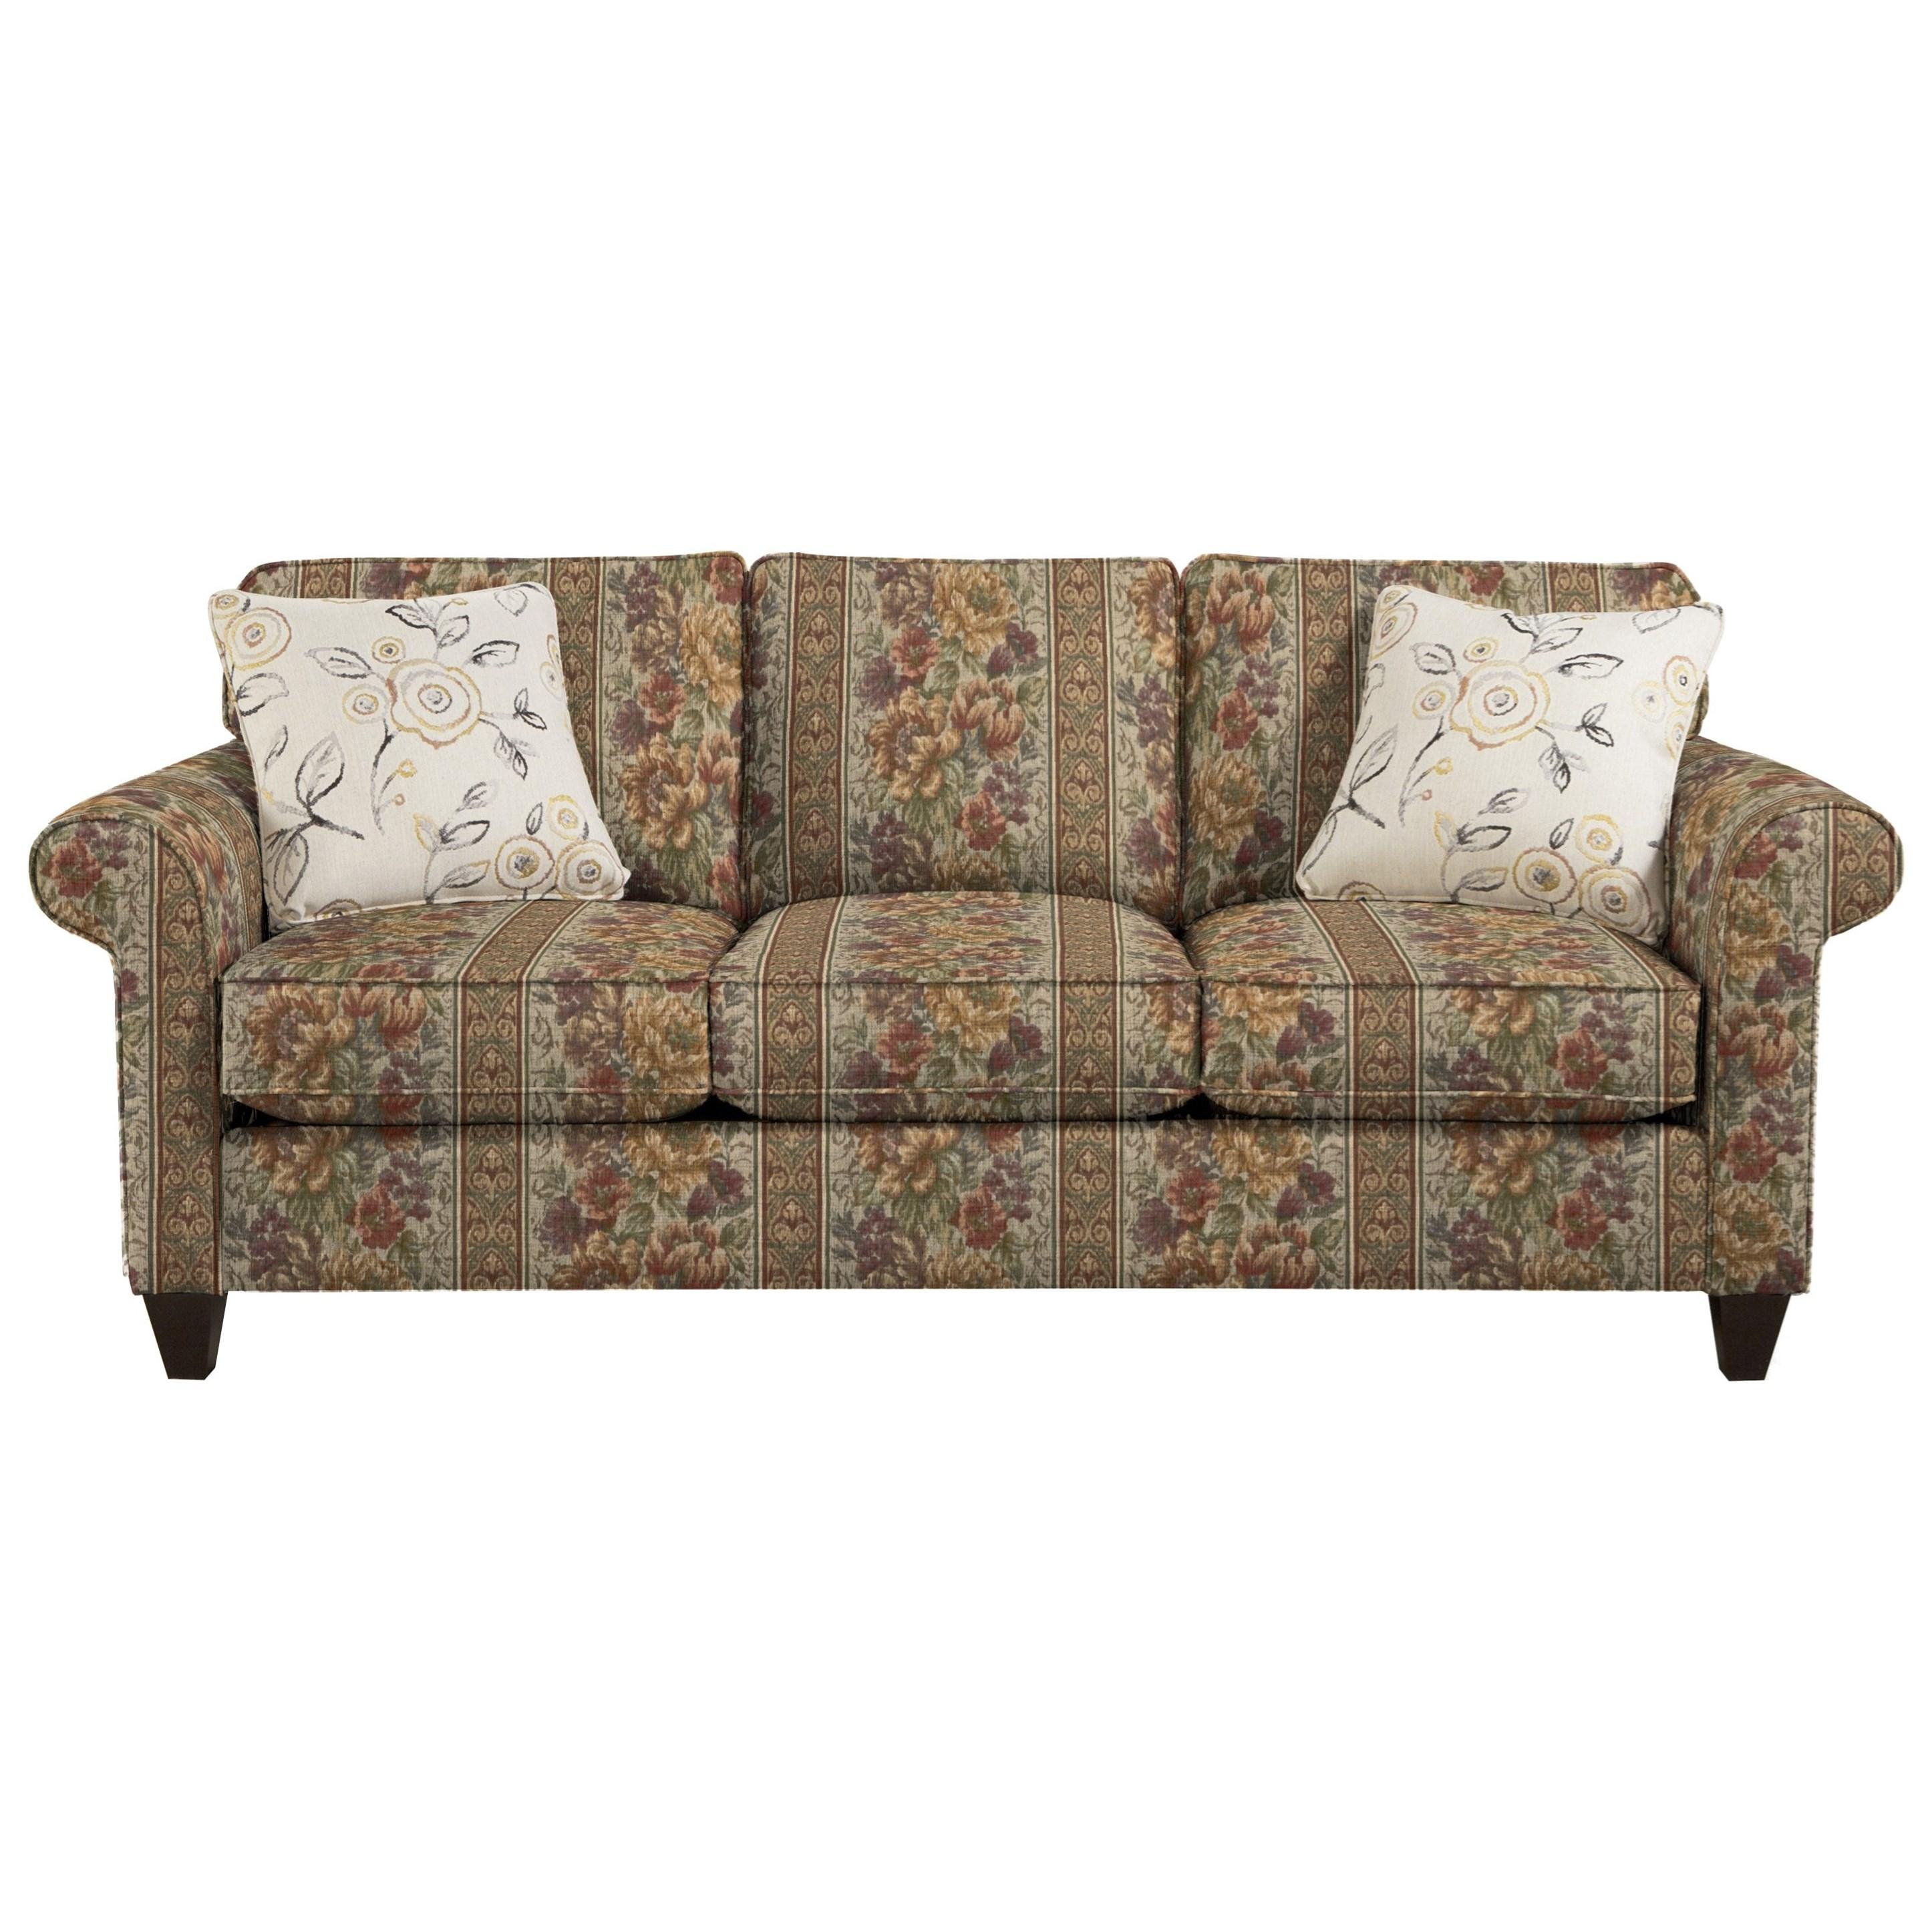 7421 Sofa by Craftmaster at Dunk & Bright Furniture